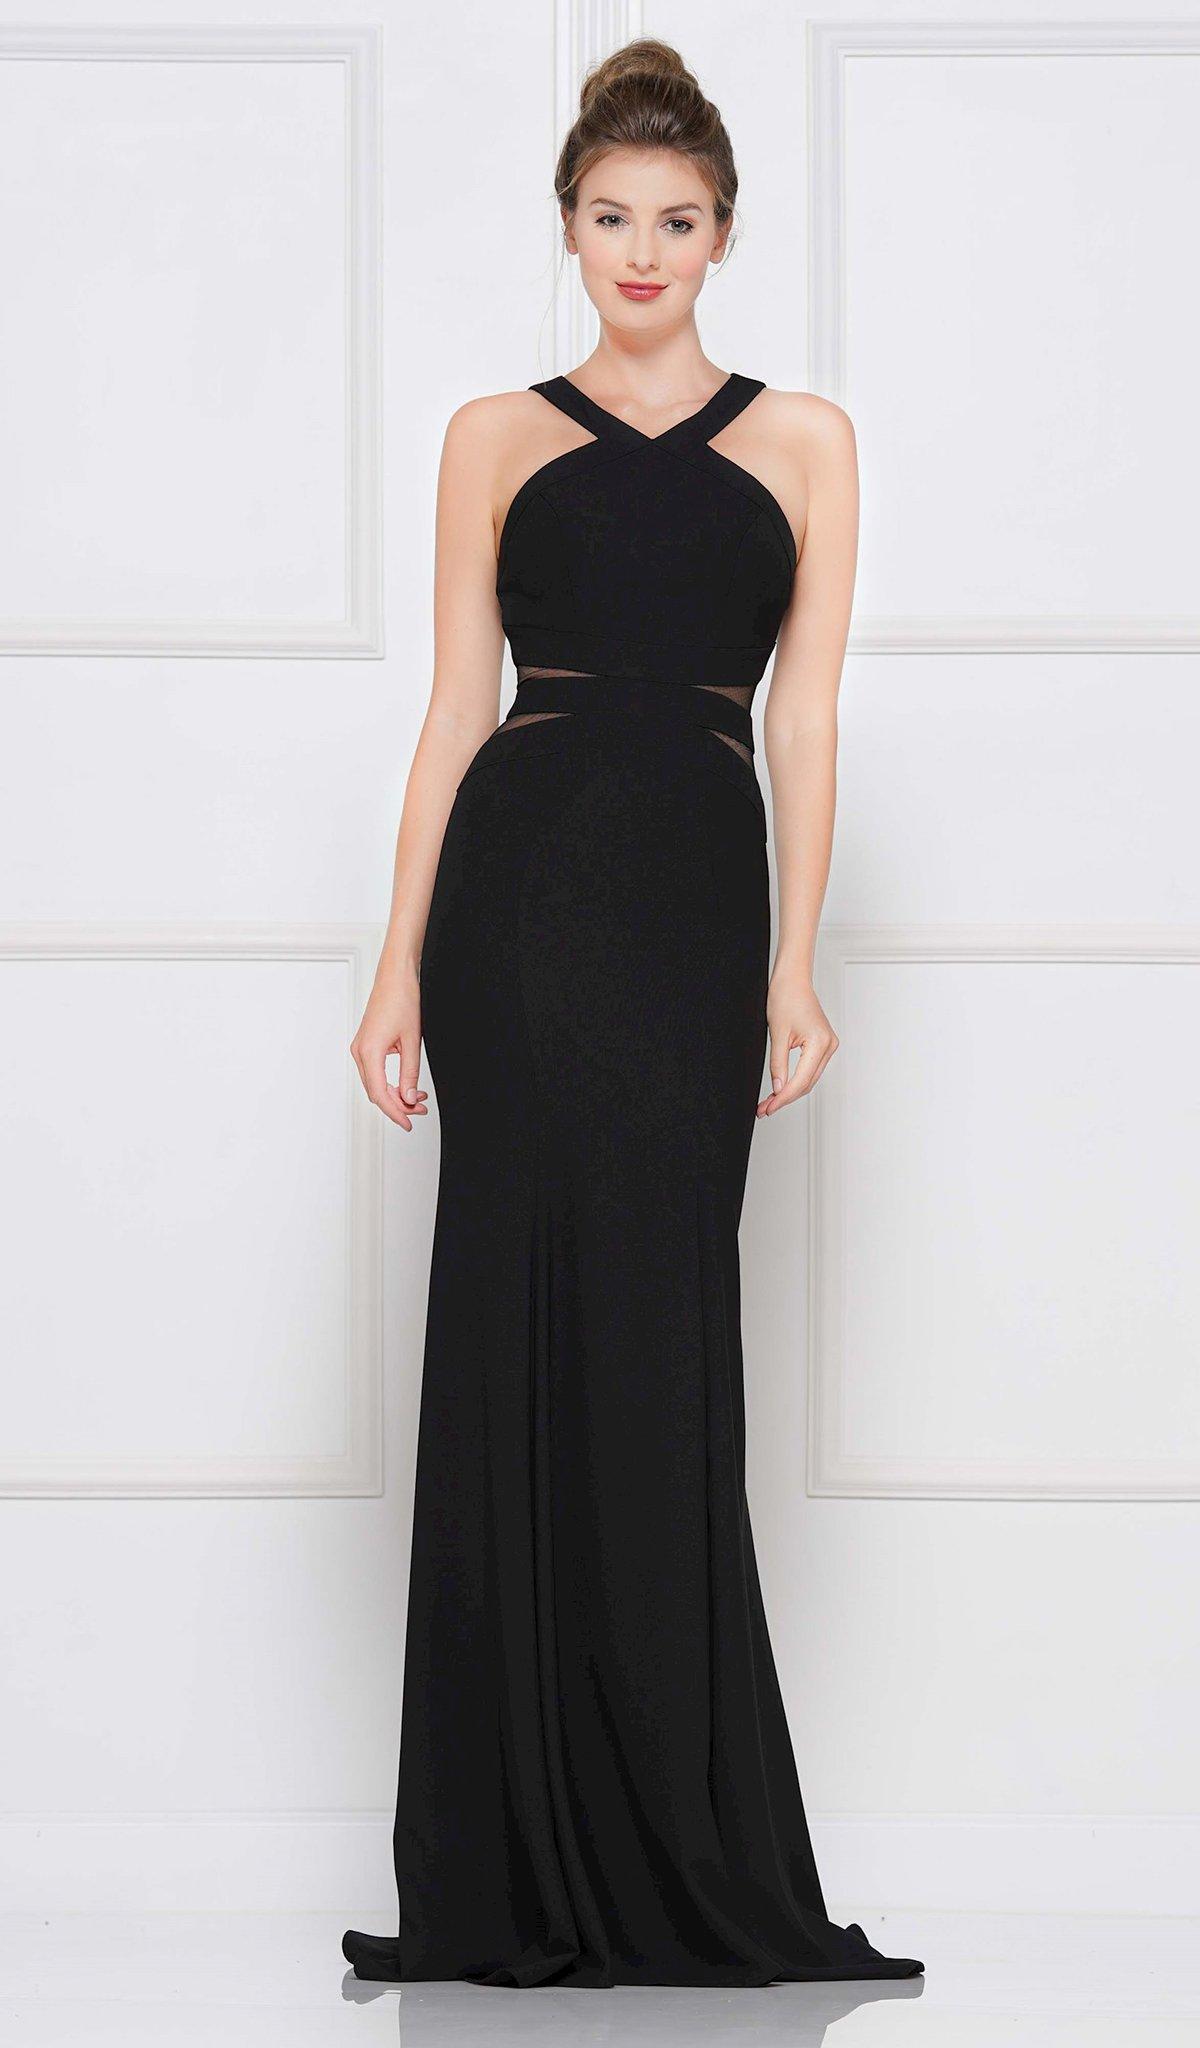 Colors Dress - 2049 Sleeveless Halter Stretch Crepe Trumpet Dress